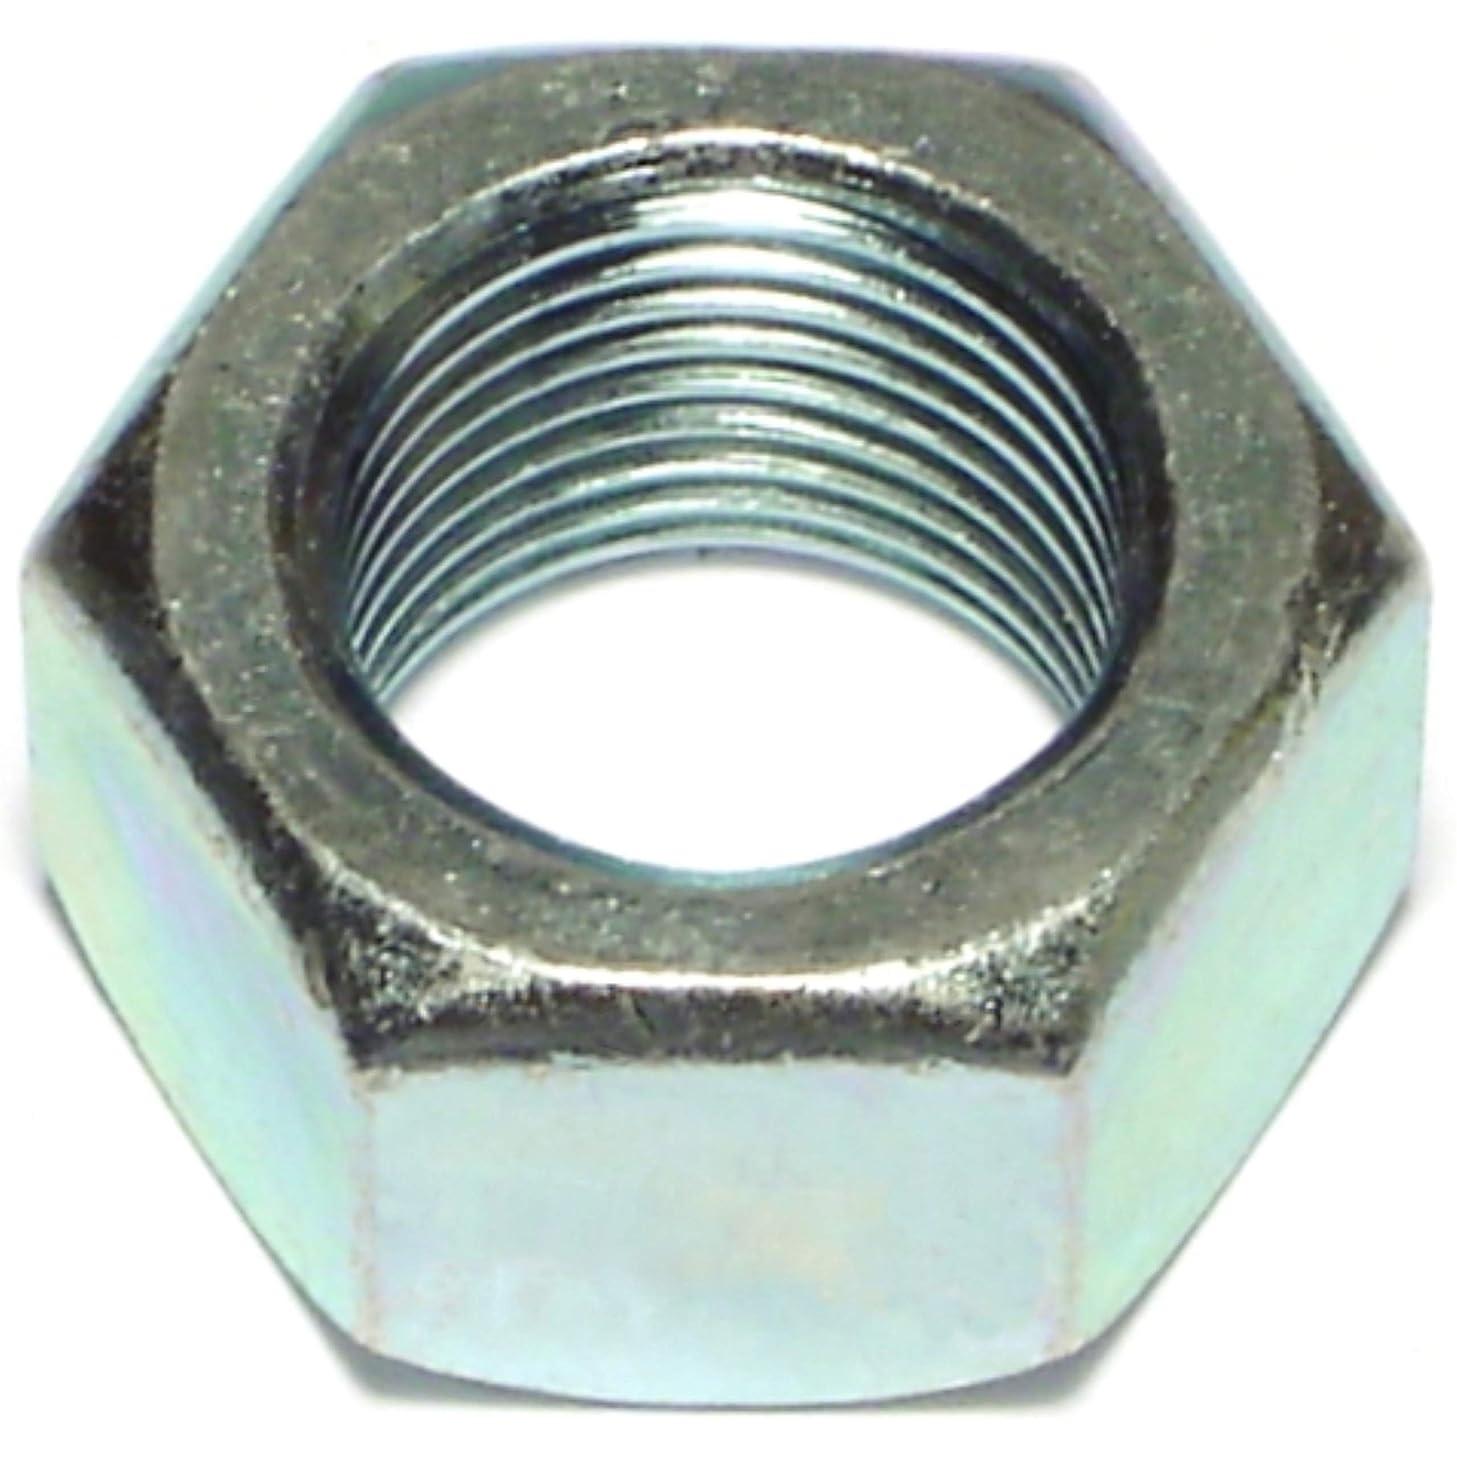 Hard-to-Find Fastener 014973242190 Fine Finished Hex Nuts, 3/4-16, Piece-20